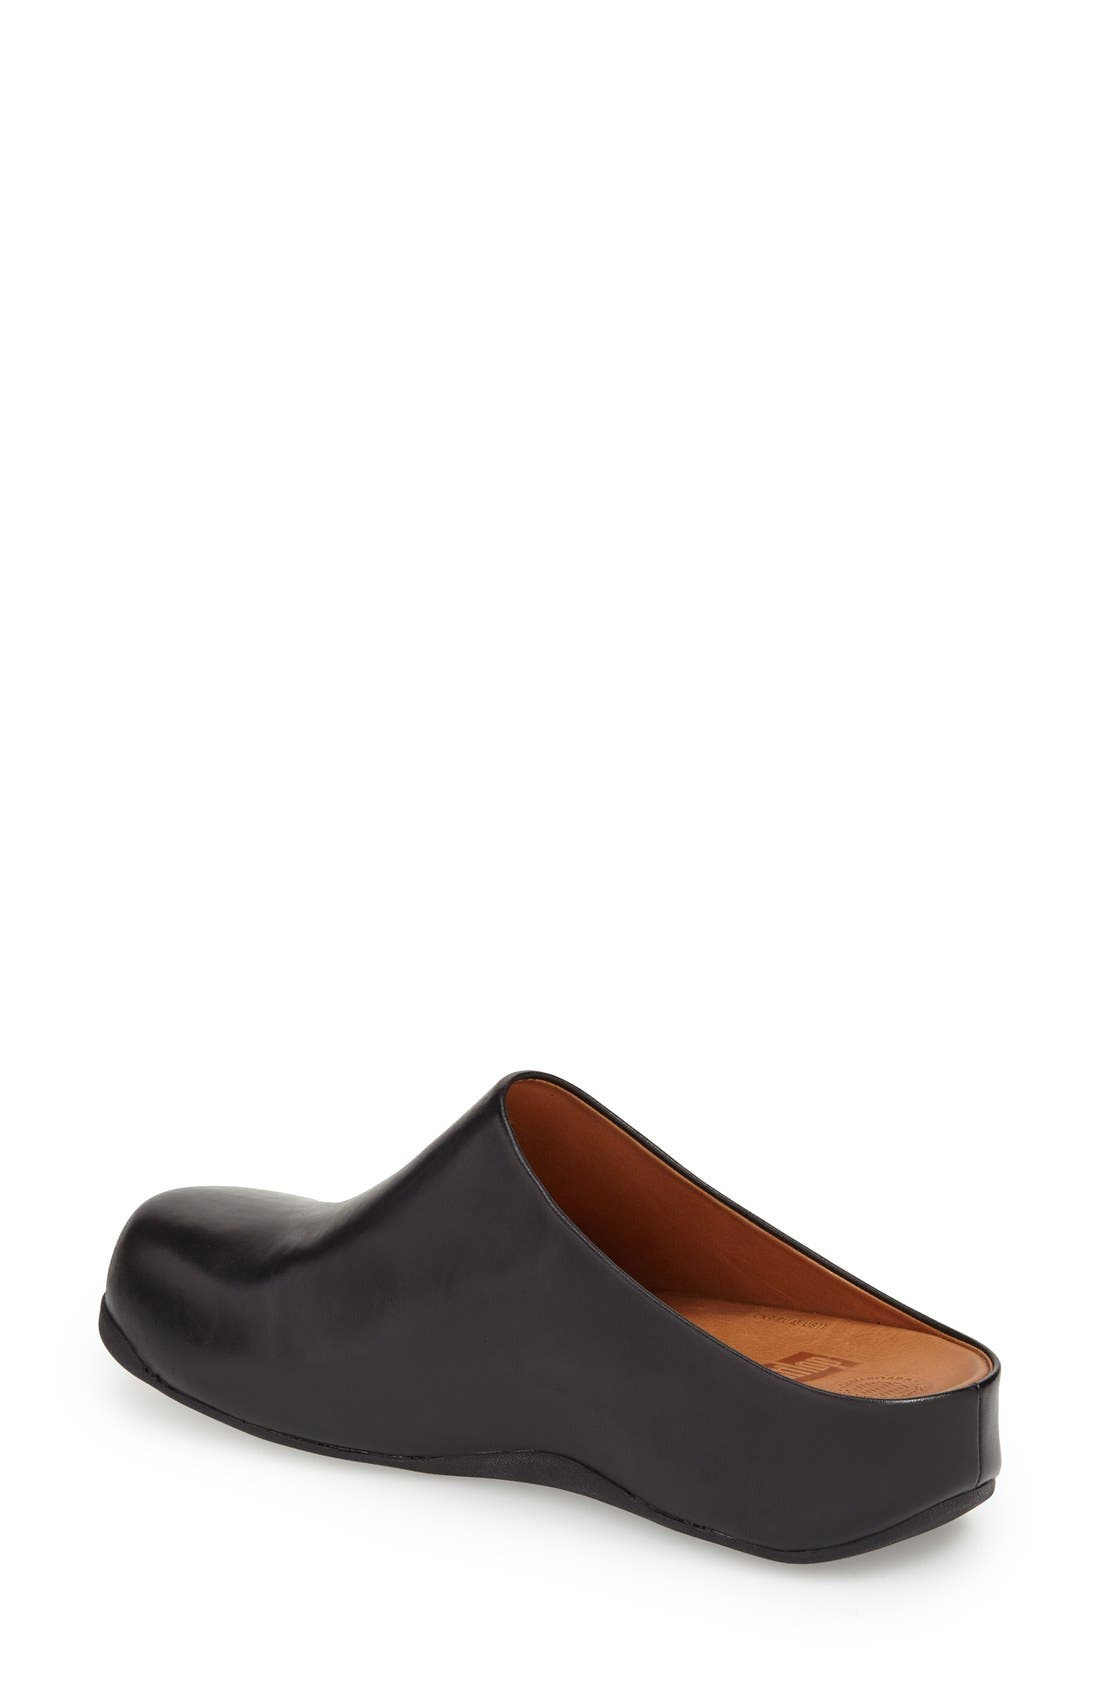 Alternate Image 2  - FitFlop 'Shuv™' Leather Clog